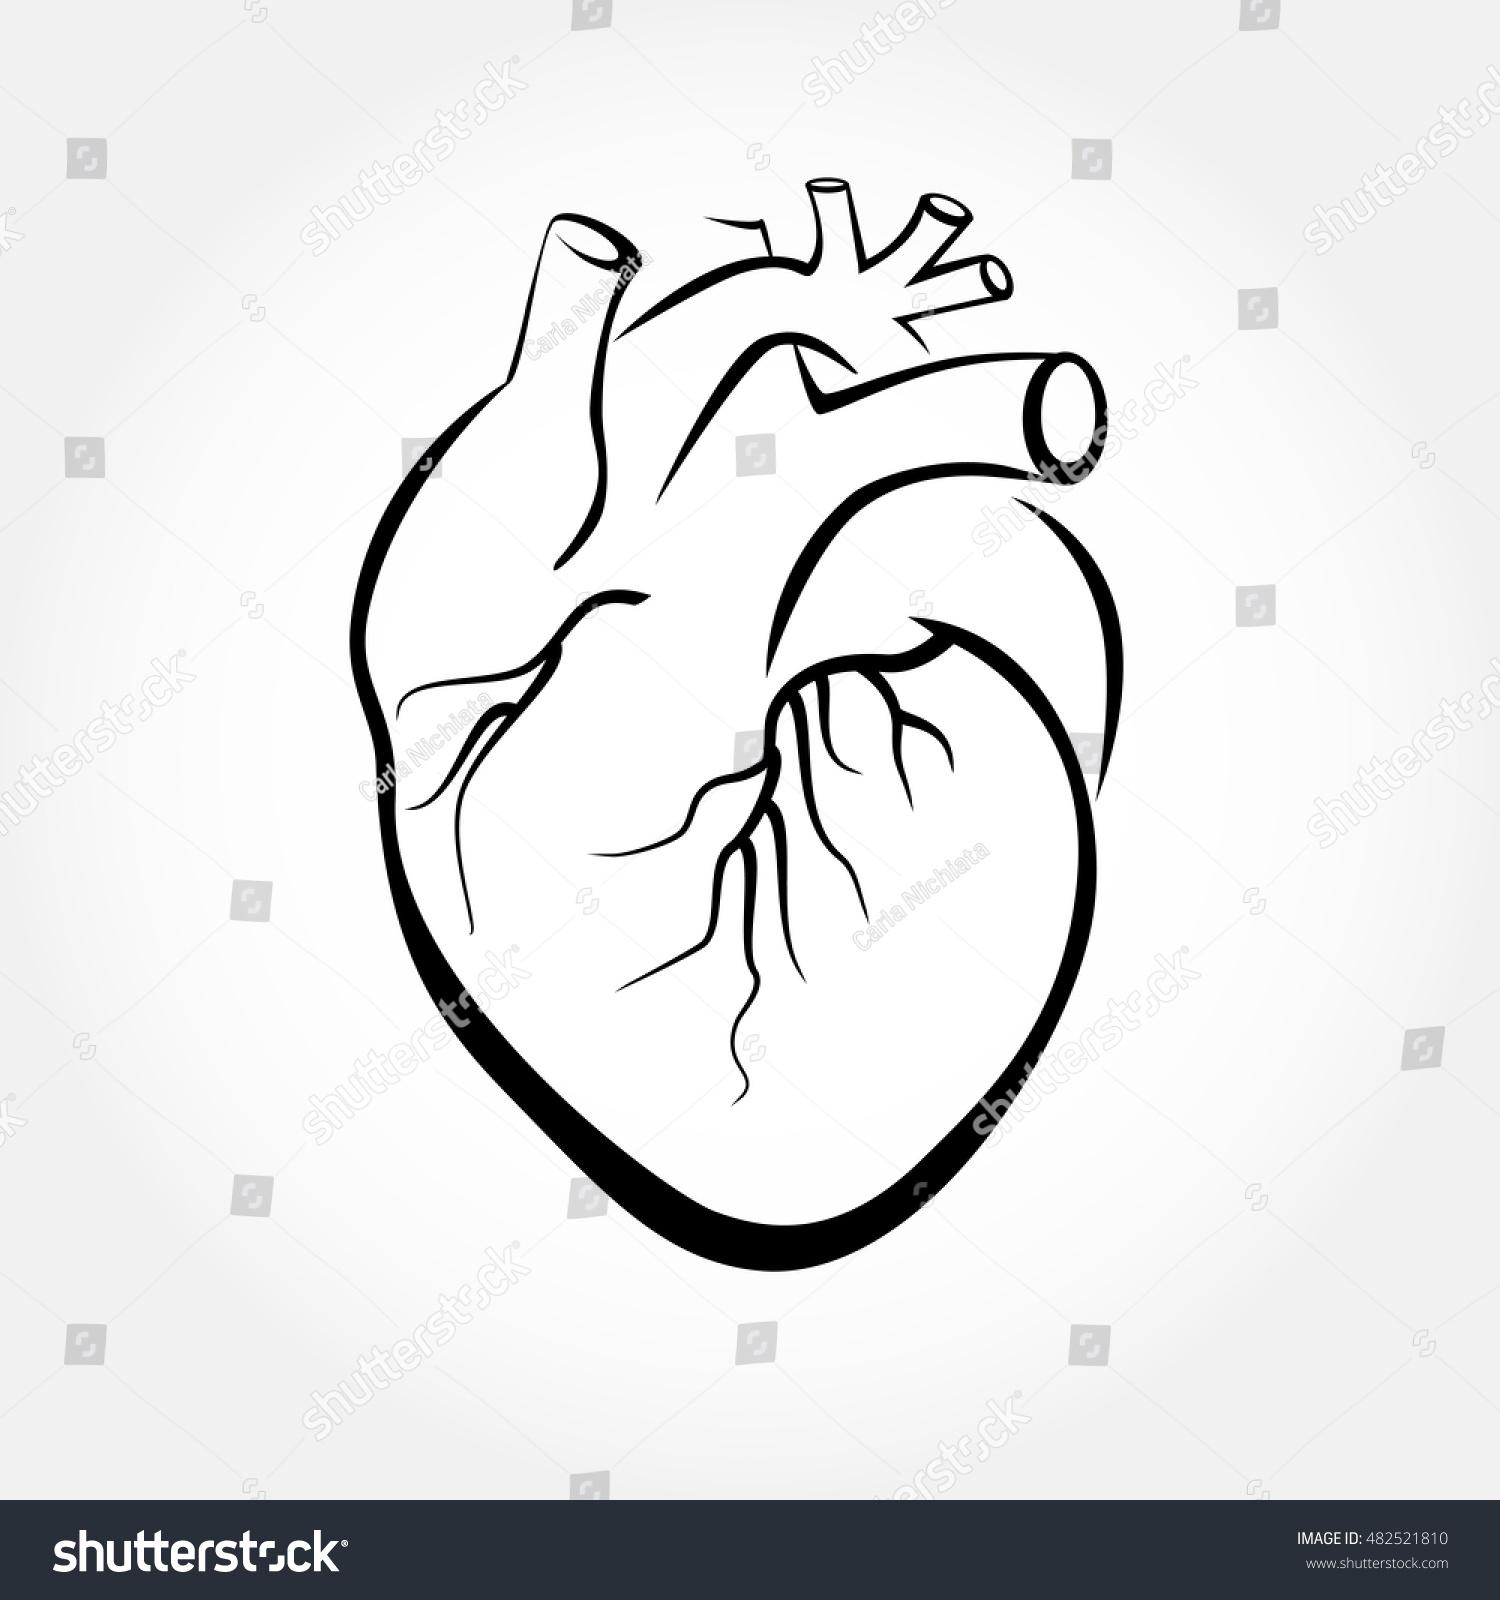 Anatomy Heart Drawing Images - human body anatomy